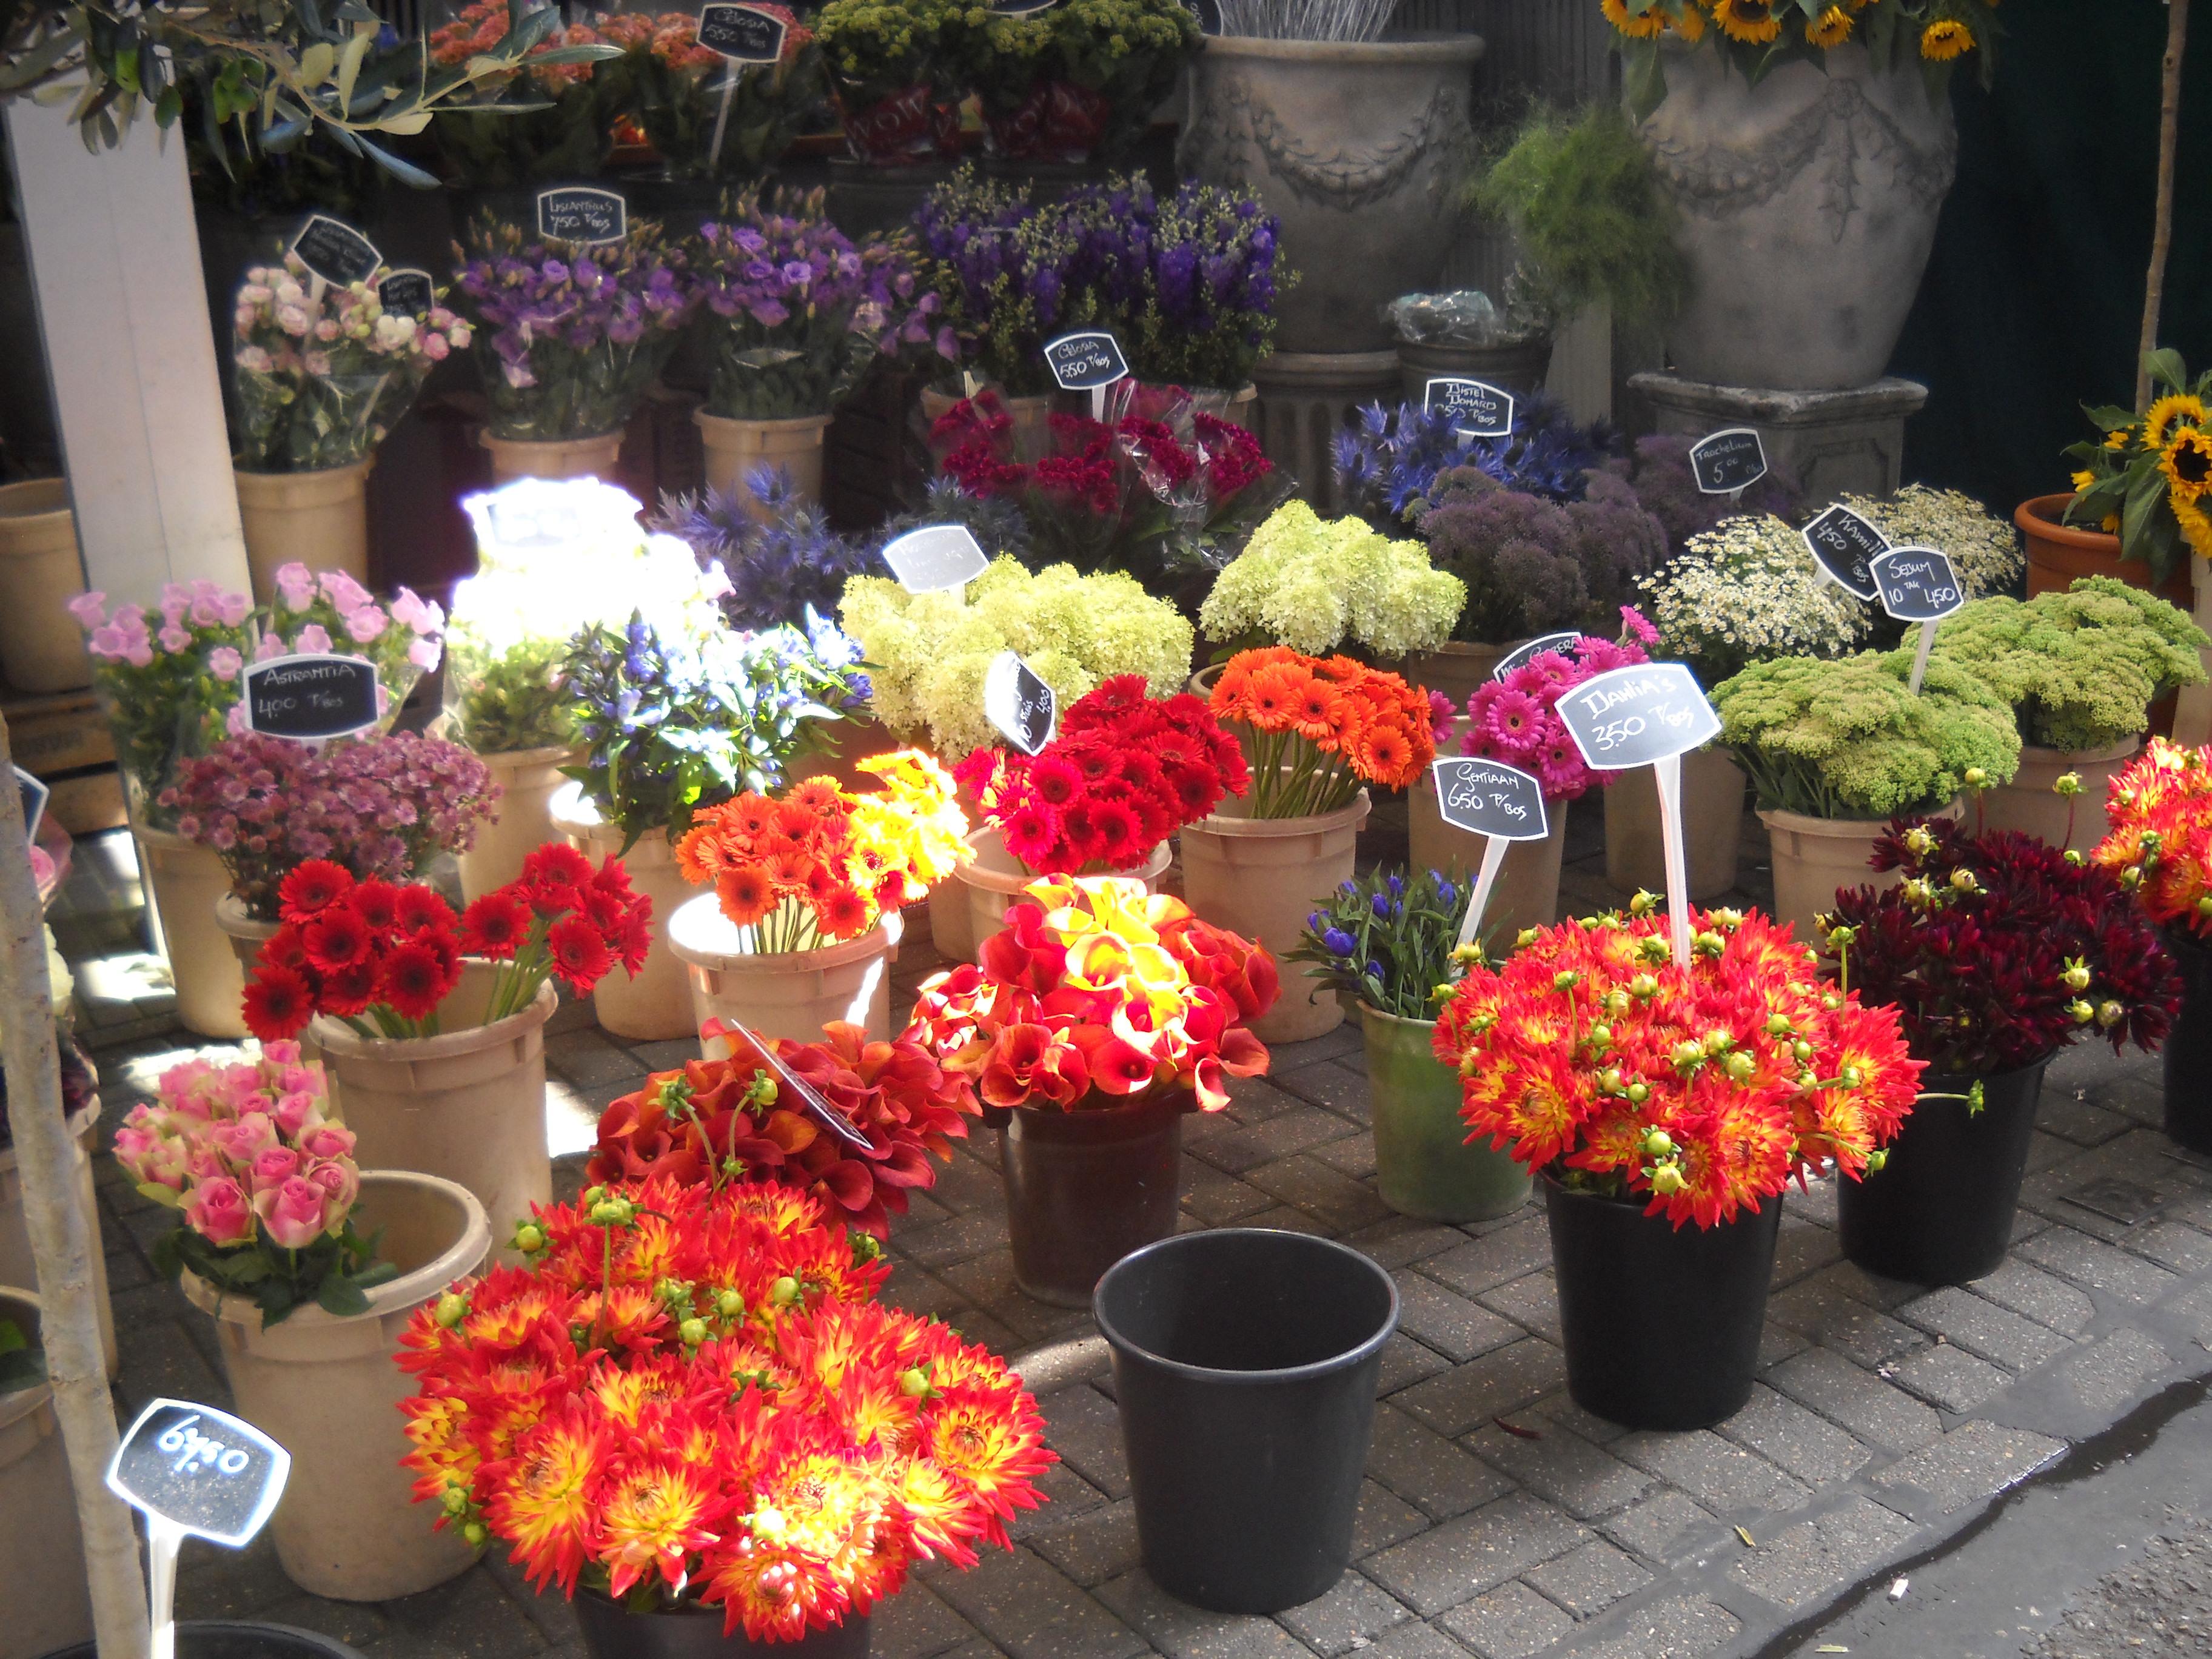 Amsterdam flowers - Flower market